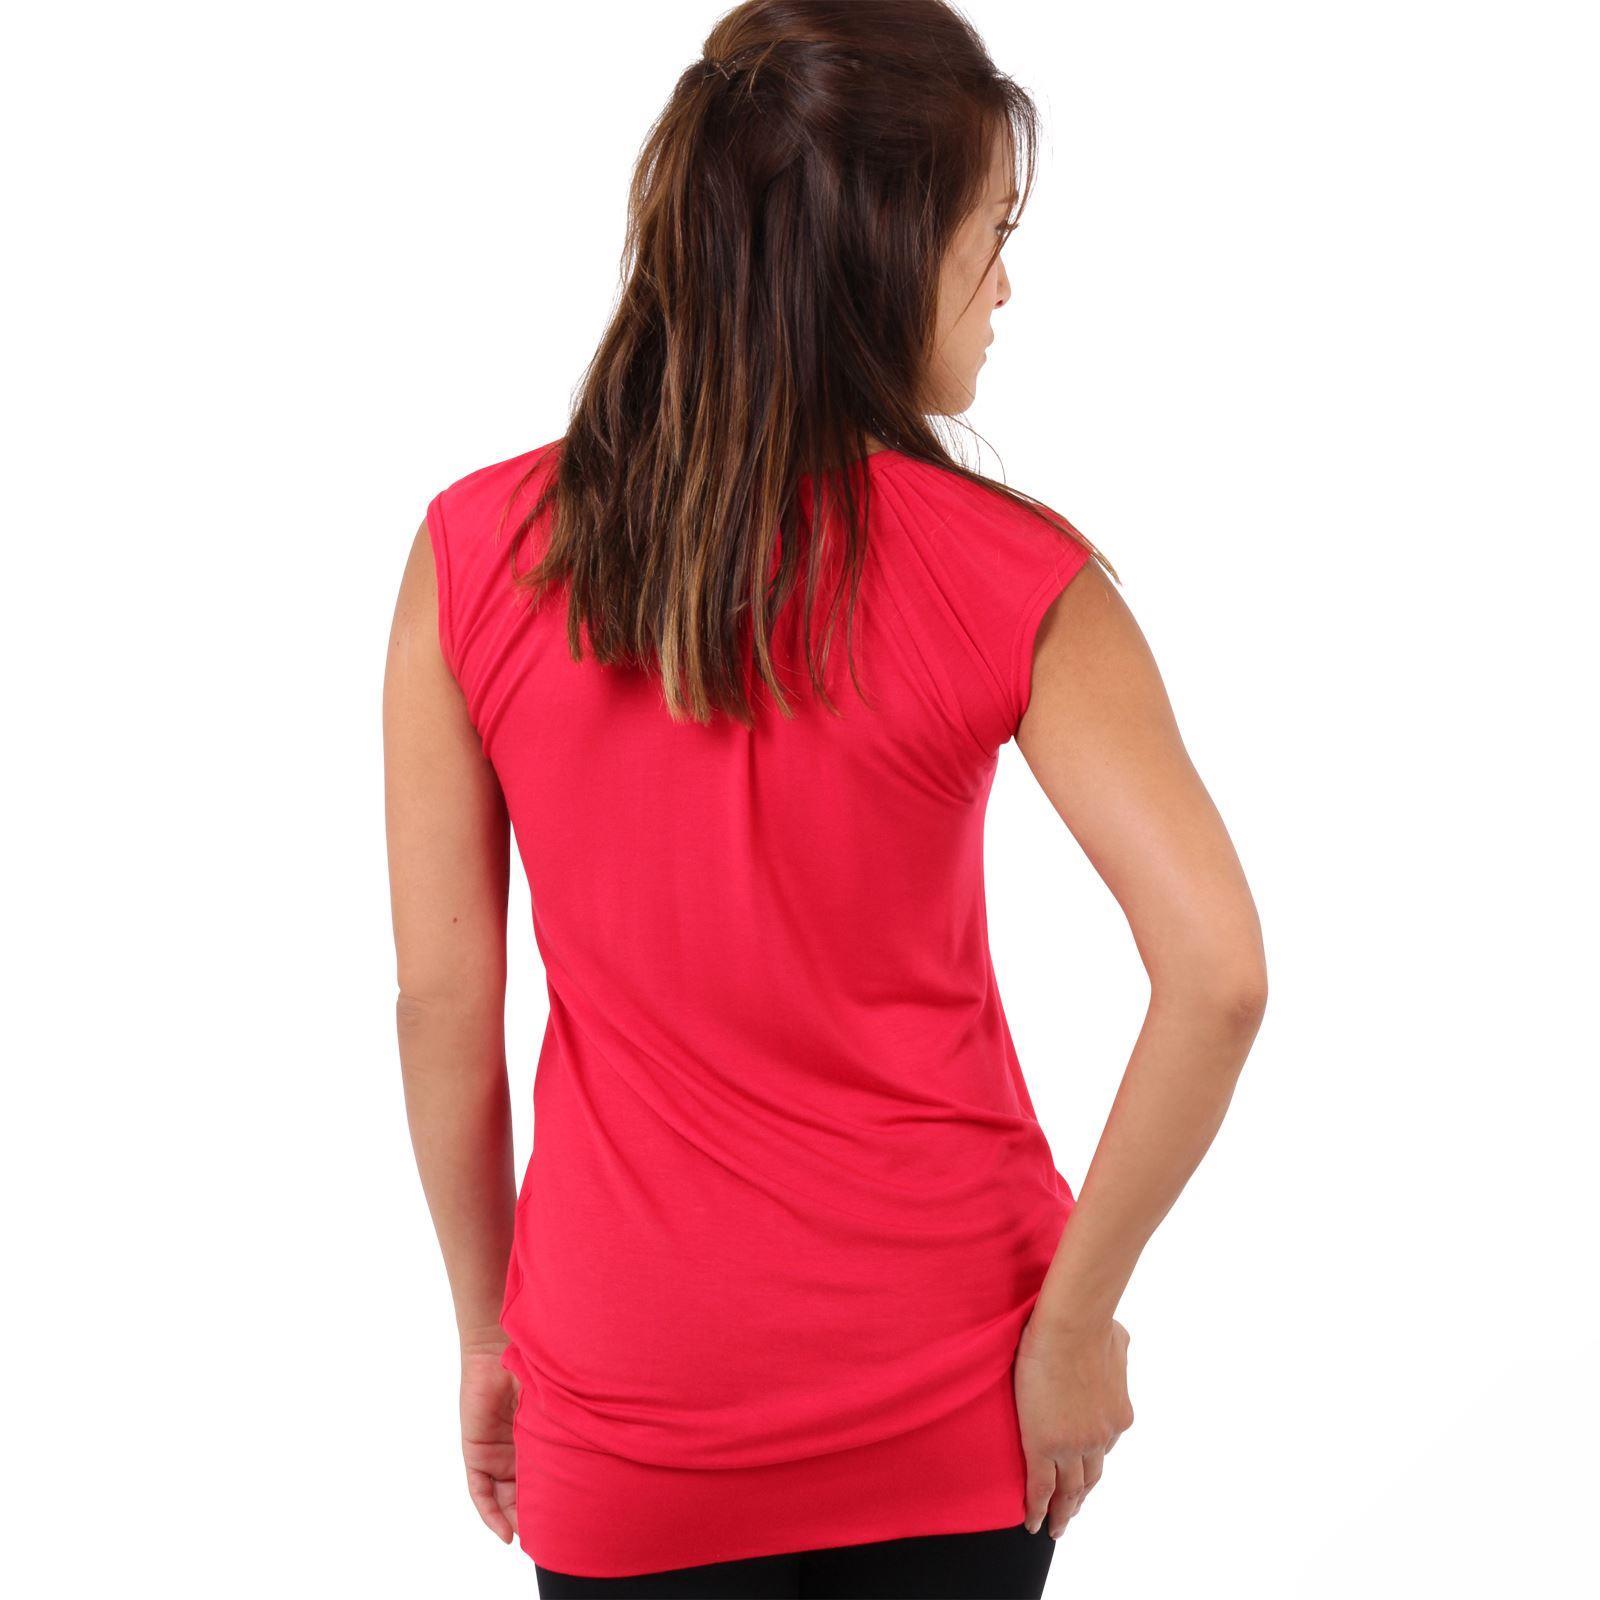 Womens-Ladies-Plain-T-Shirt-Short-Sleeve-Long-Loose-V-Neck-Blouse-Tunic-Top thumbnail 49